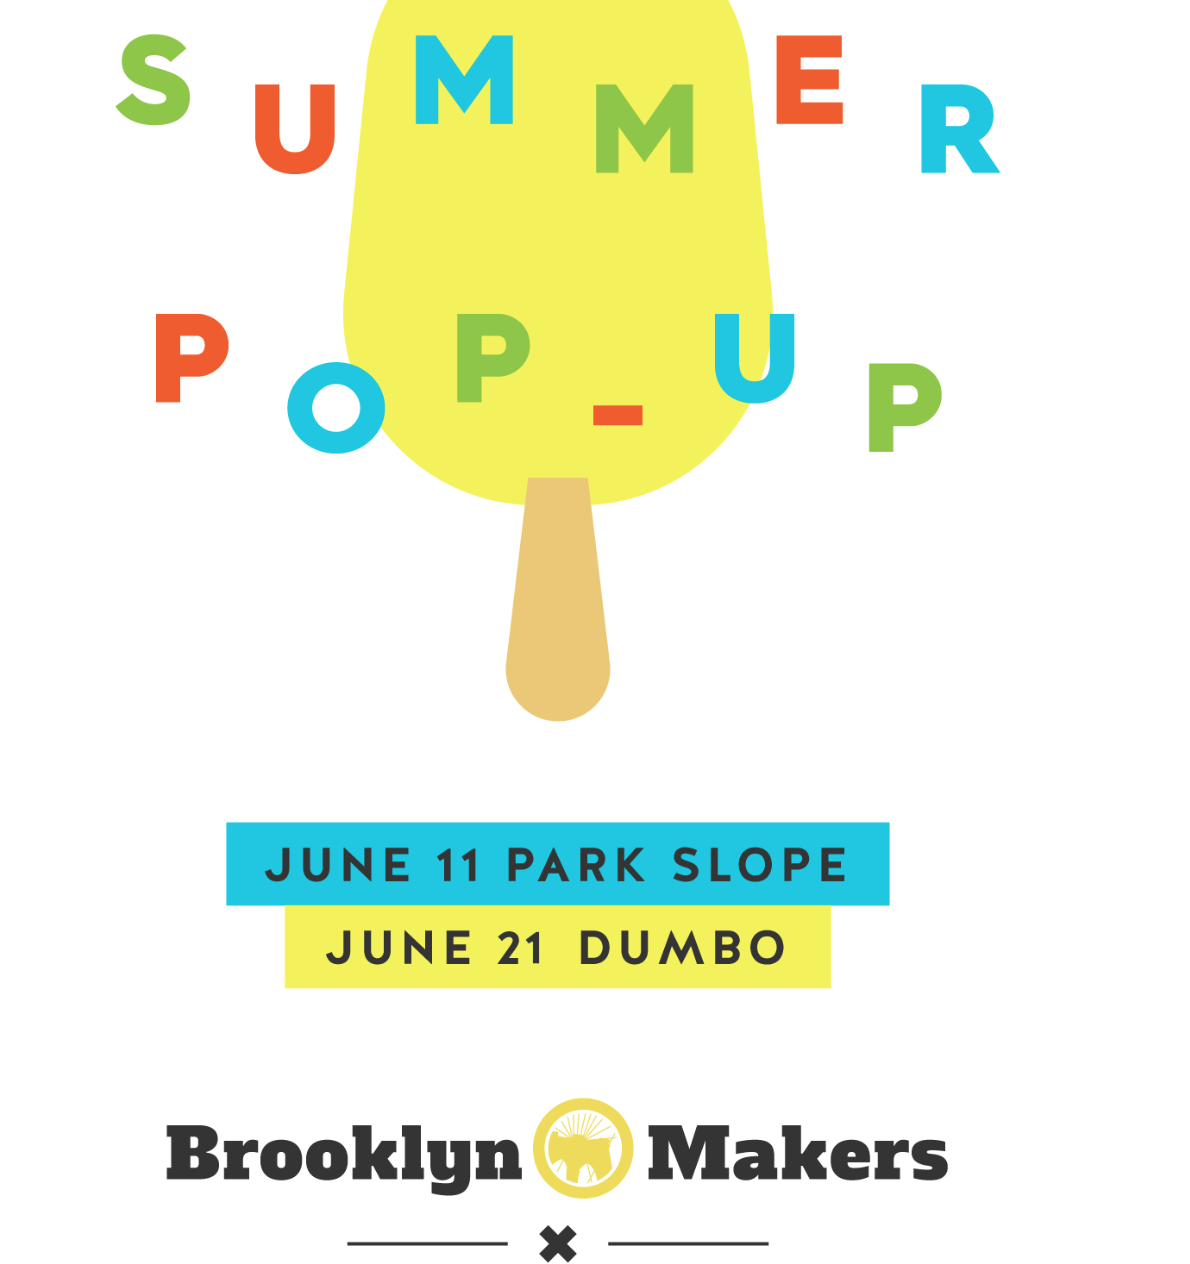 brooklyn makers